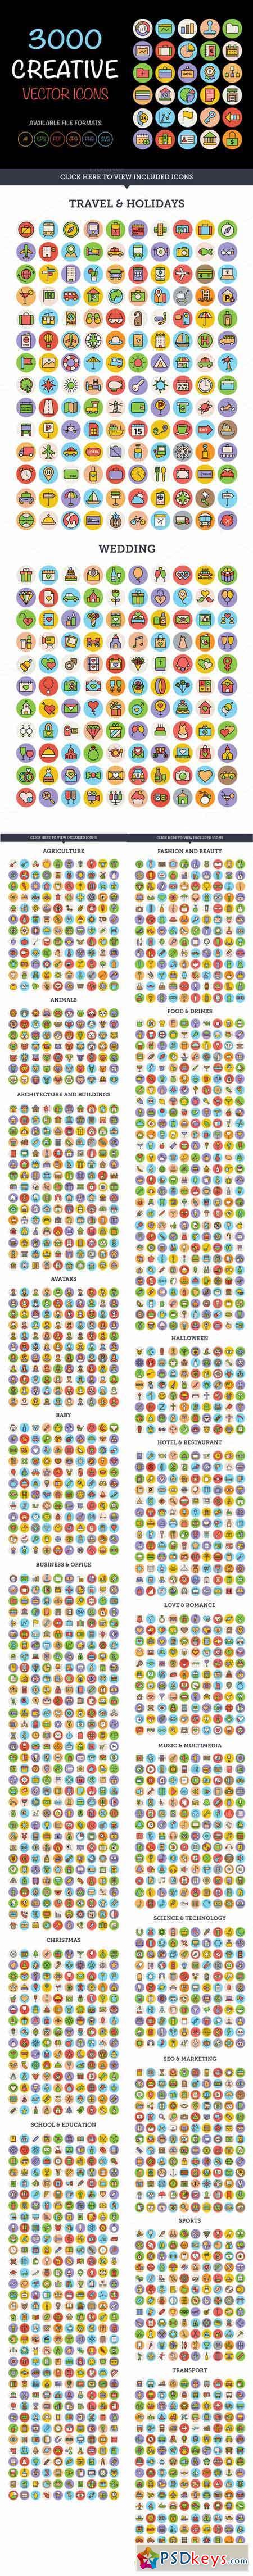 3000 Creative Vector Icons Bundle 407912